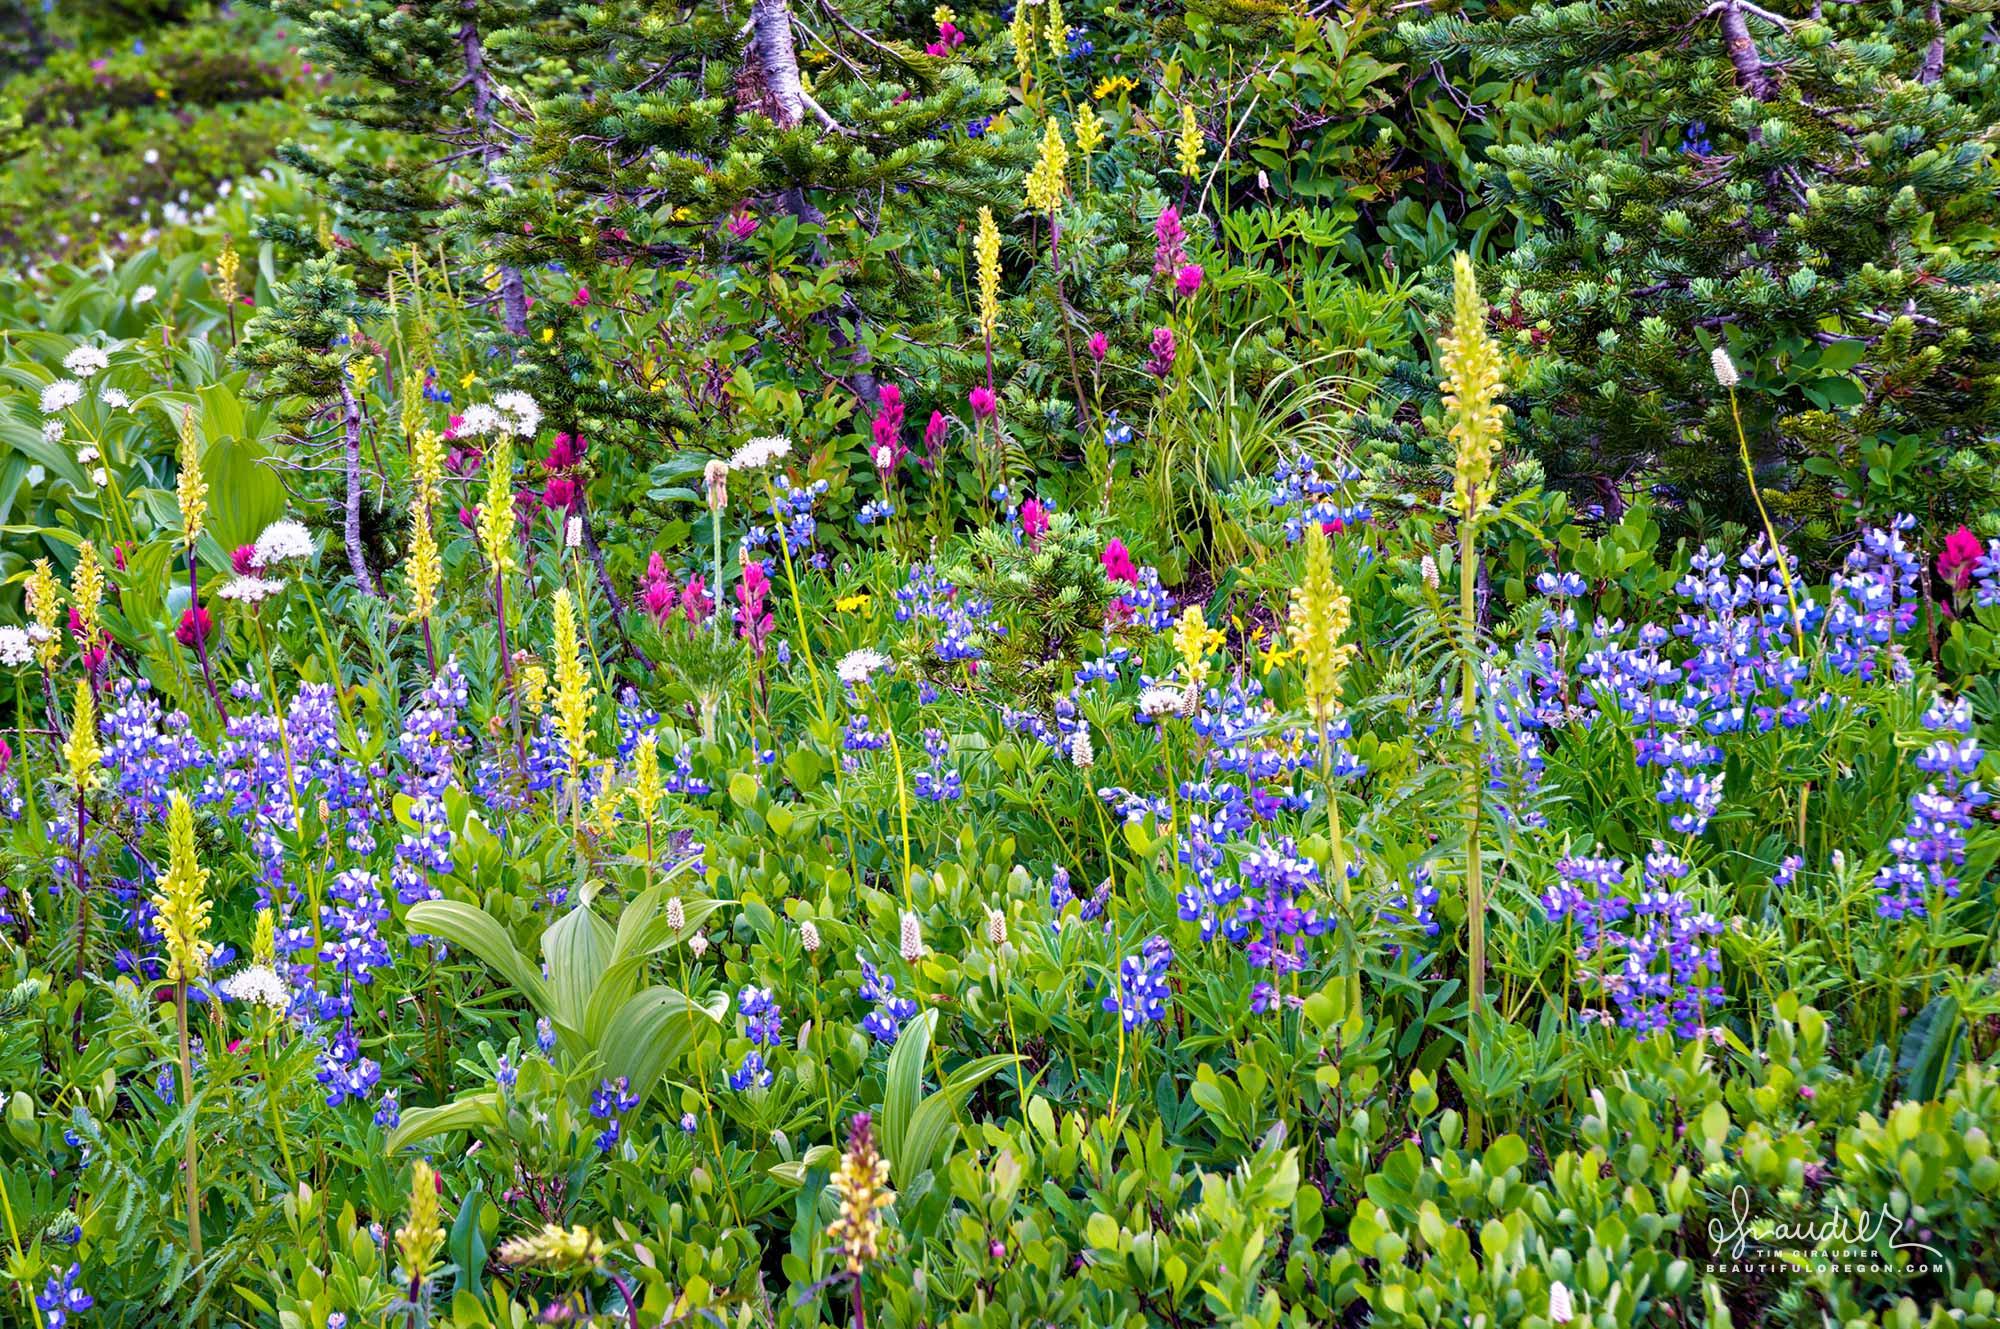 The wildflower wonderland at Paradise Meadows, Mount Rainier National Park. Washington State Cascades.